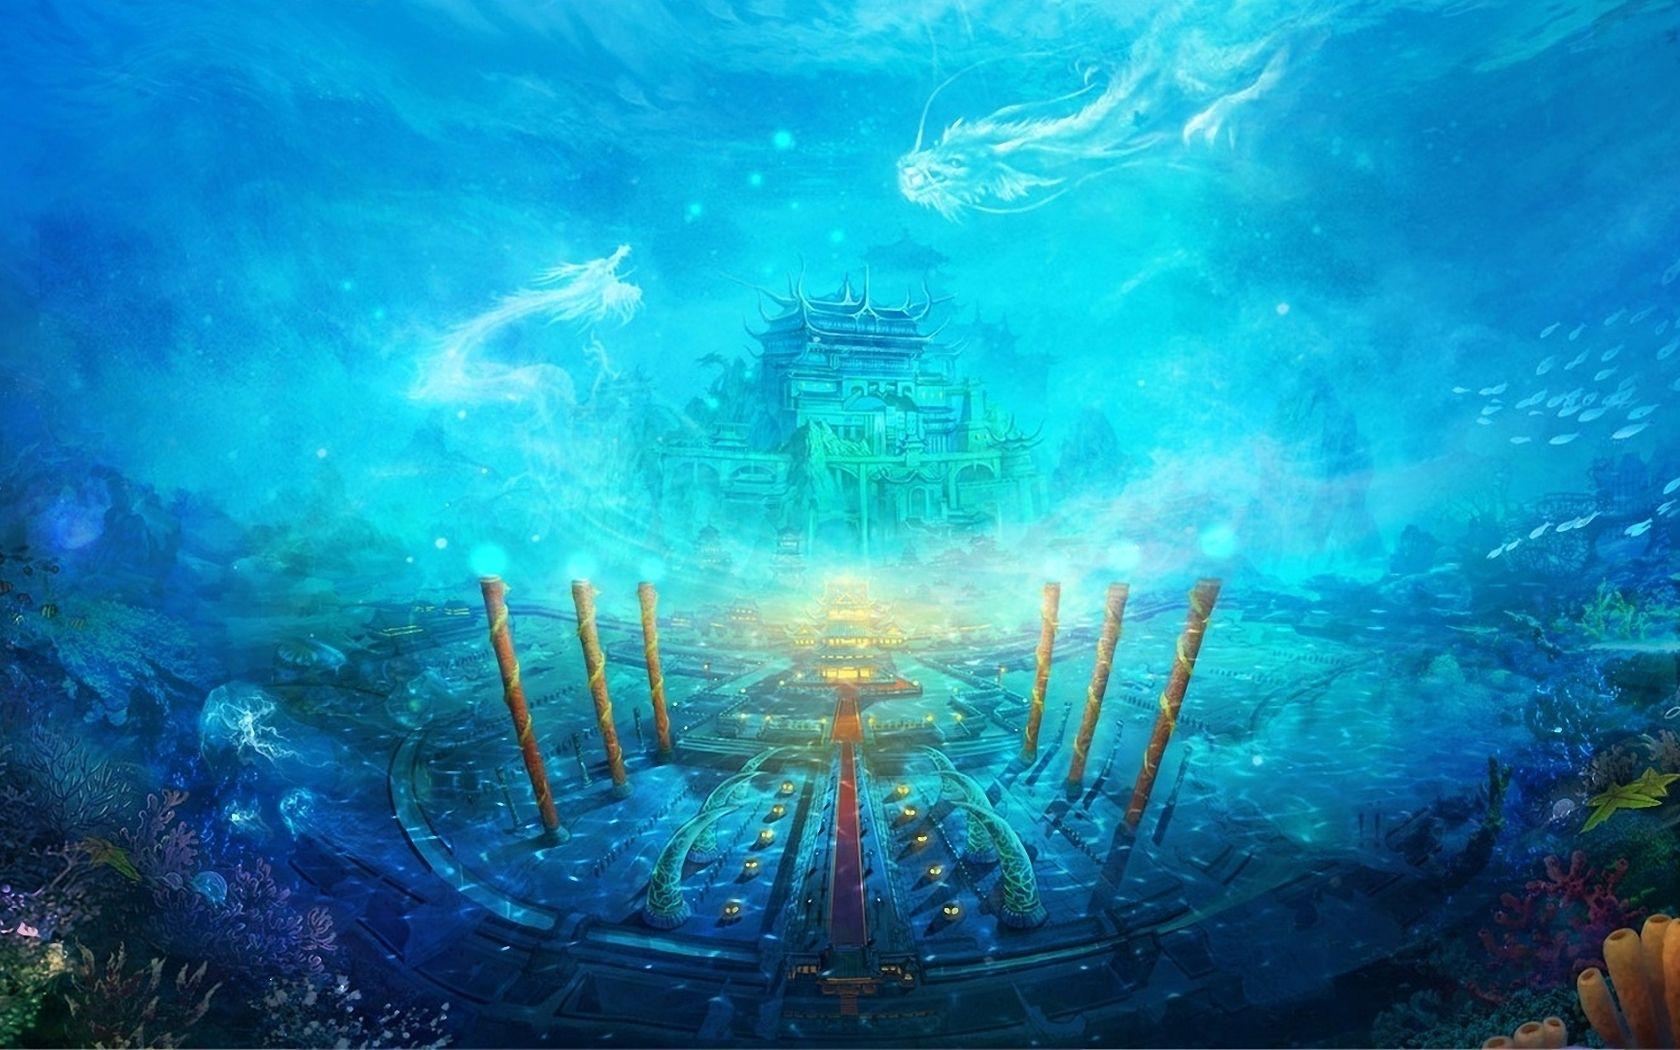 Hd Wallpapers Ocean Wallpaper Underwater City Dragon City